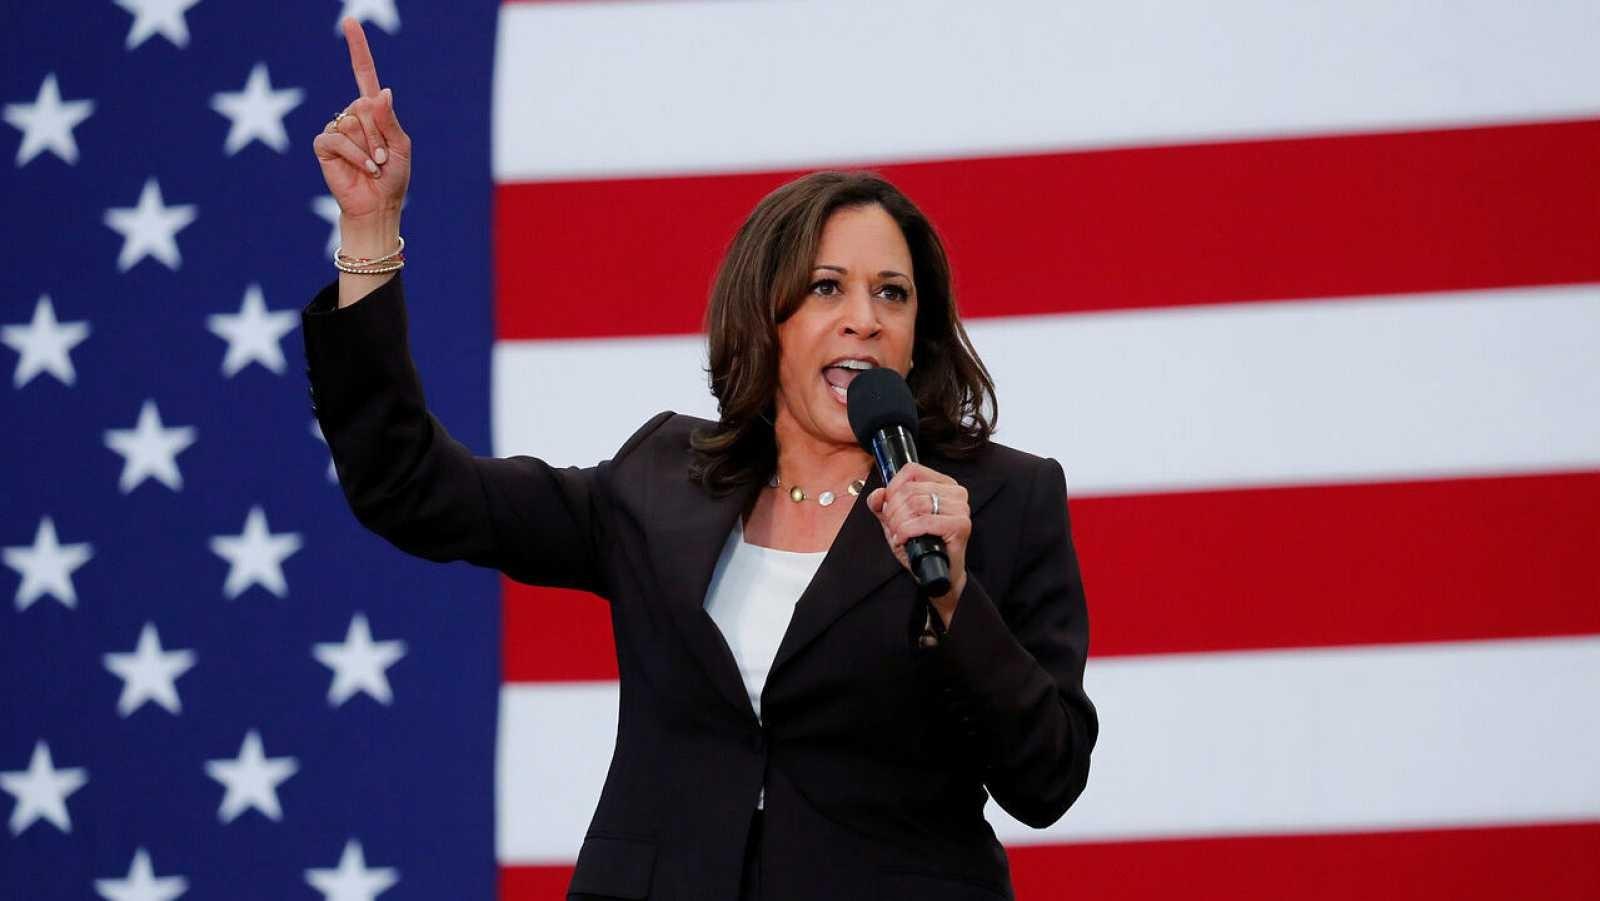 USA. KAMALA HARRIS, vicepresidenta electa: primera mujer en llegar a la Casa Blanca